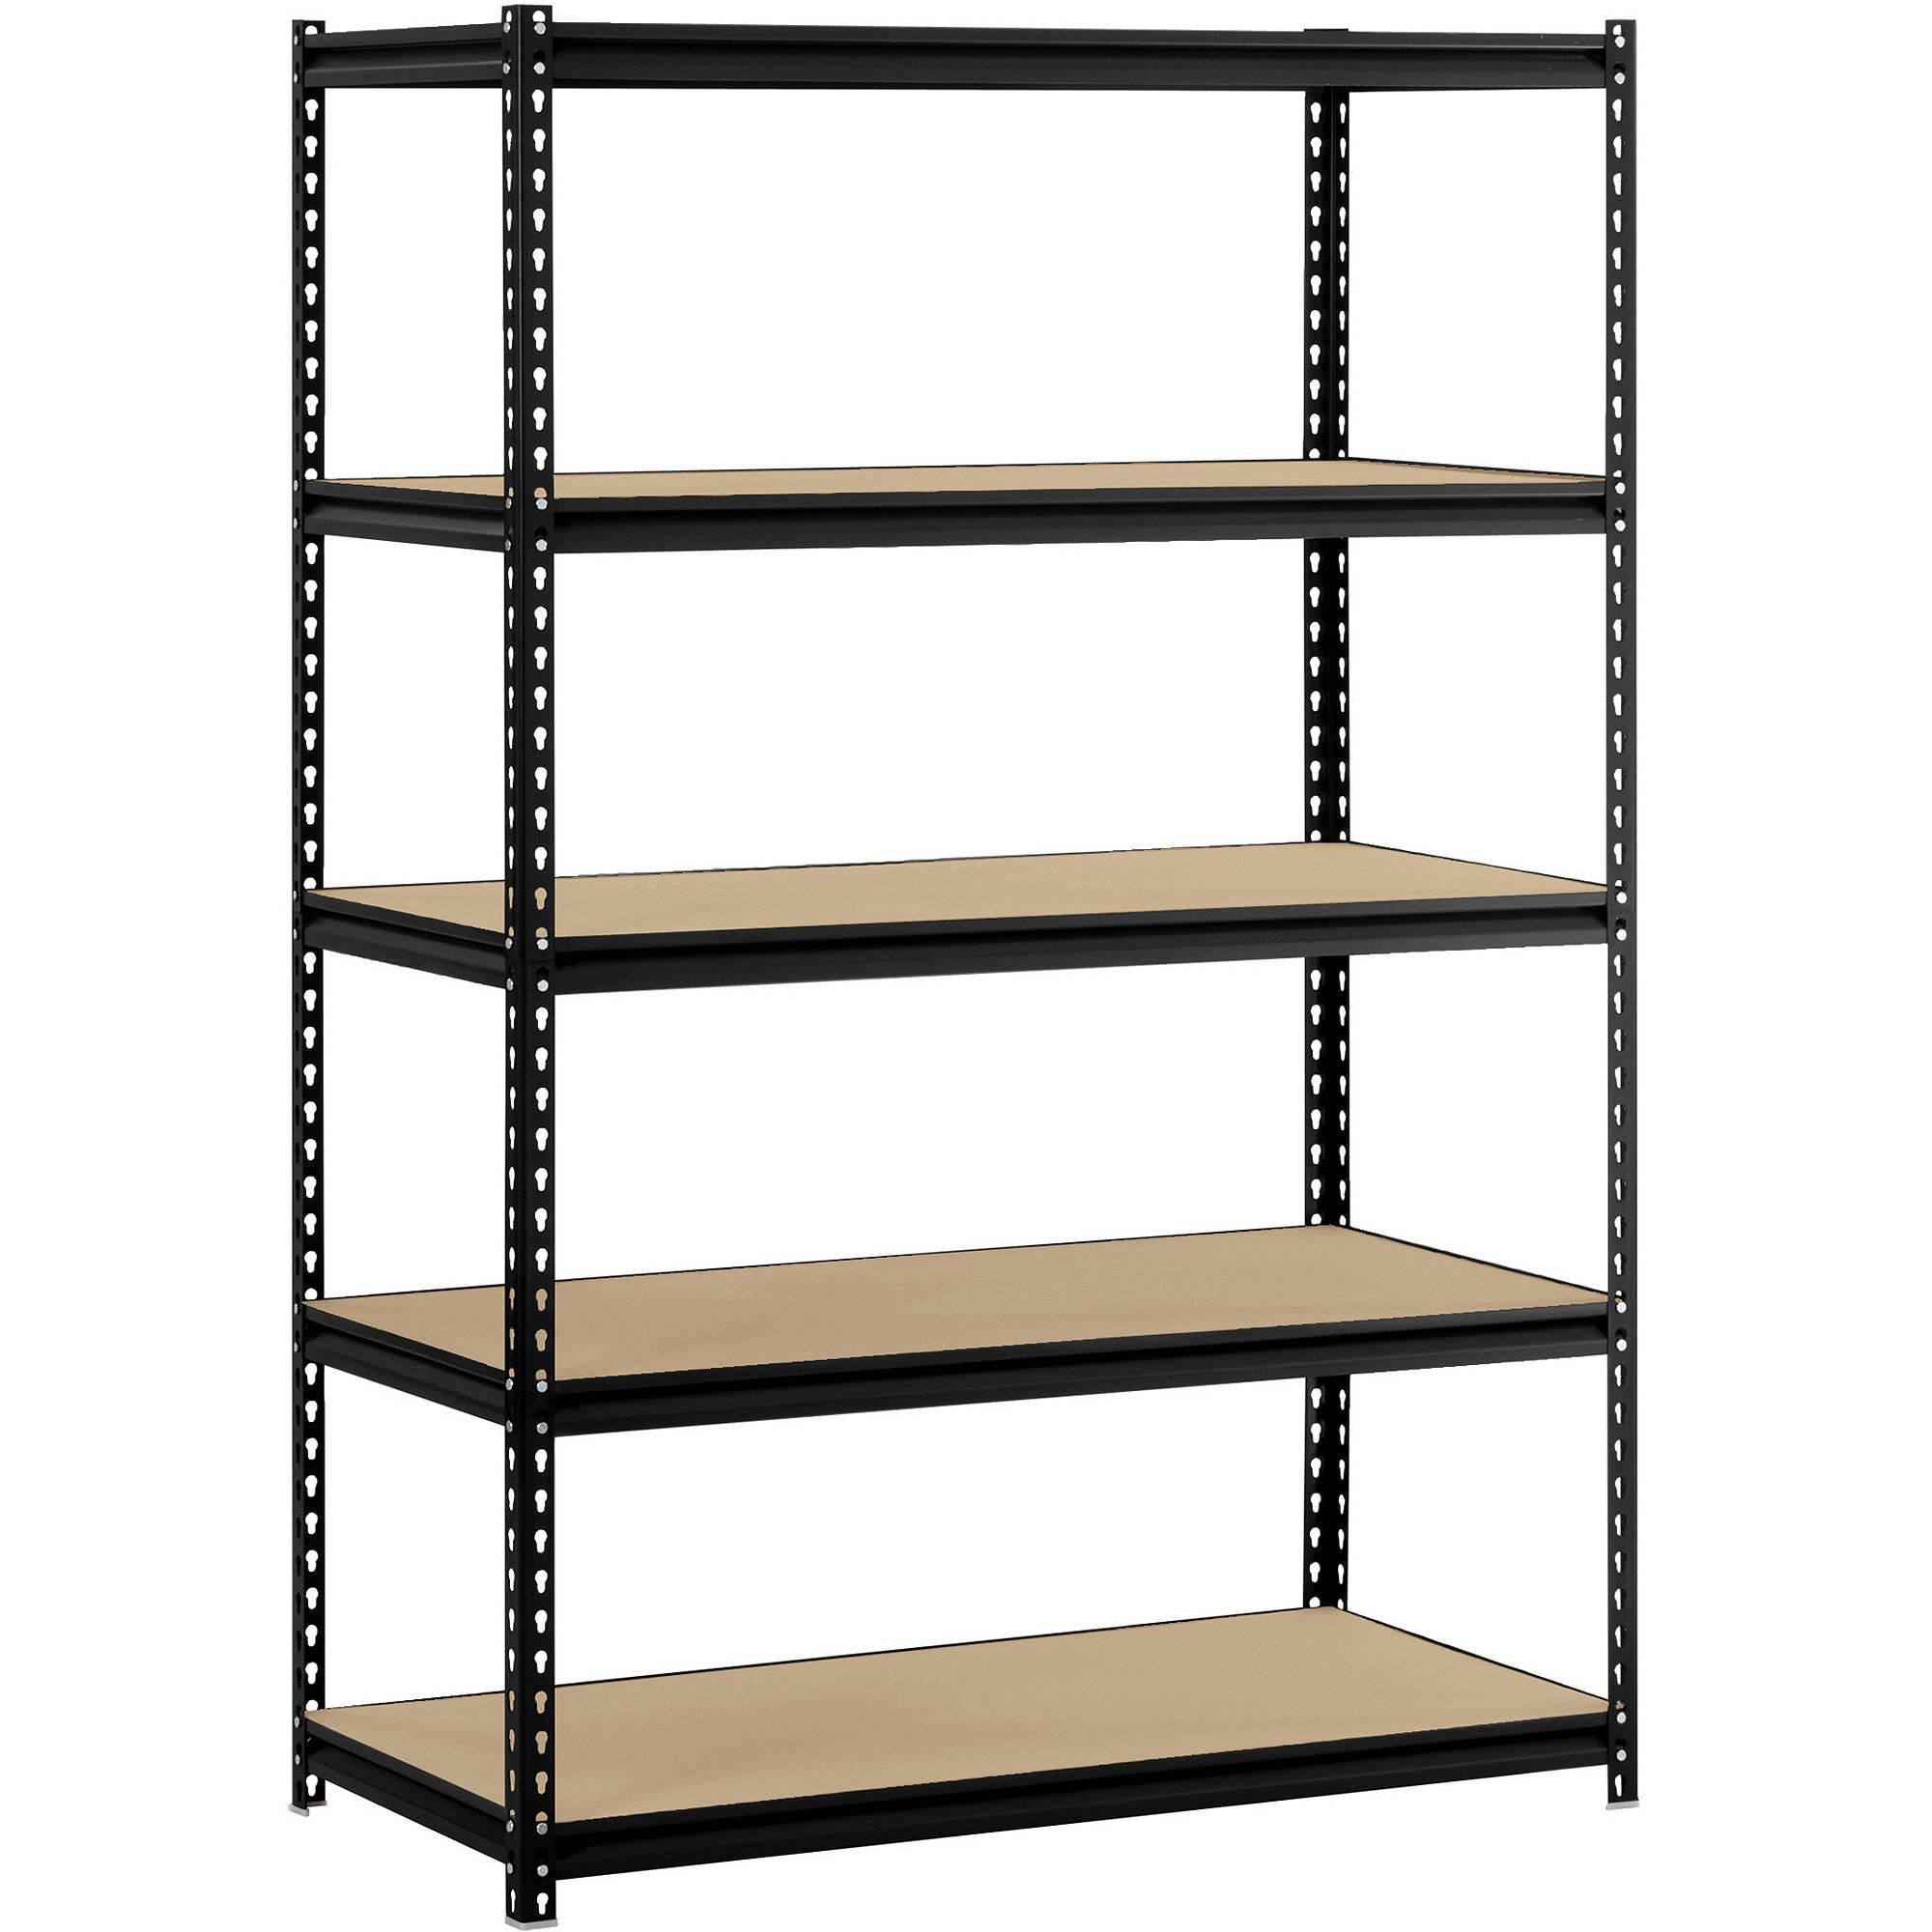 Storage racks muscle rack 48 FJWFHCI